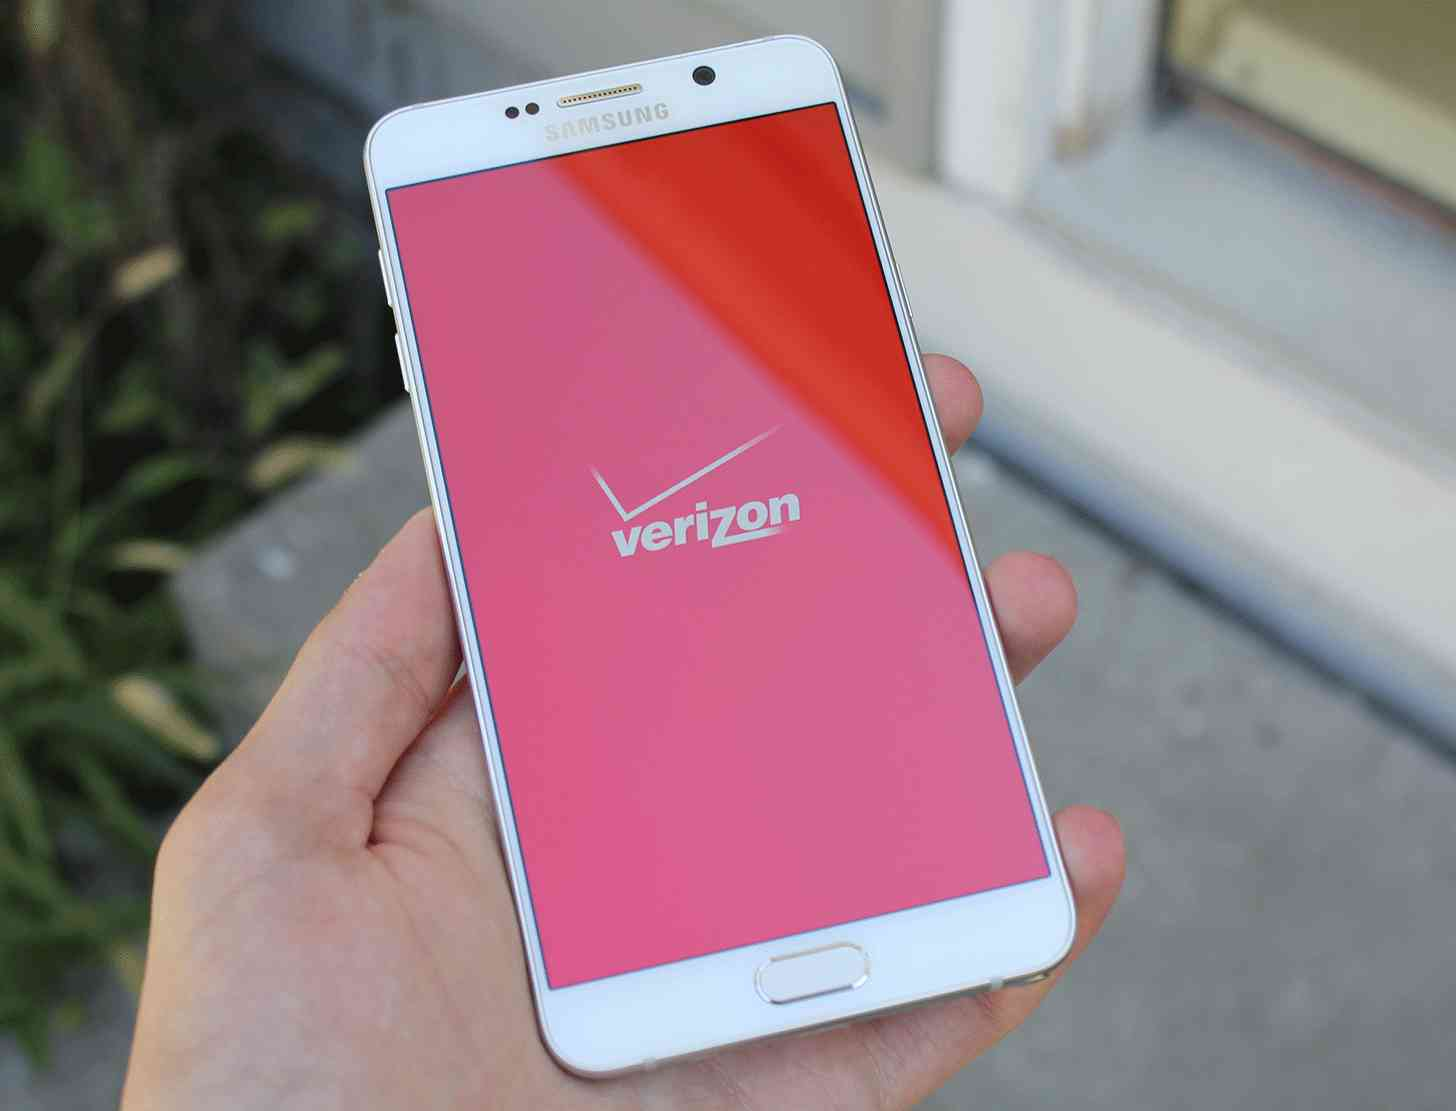 Verizon wireless business plan